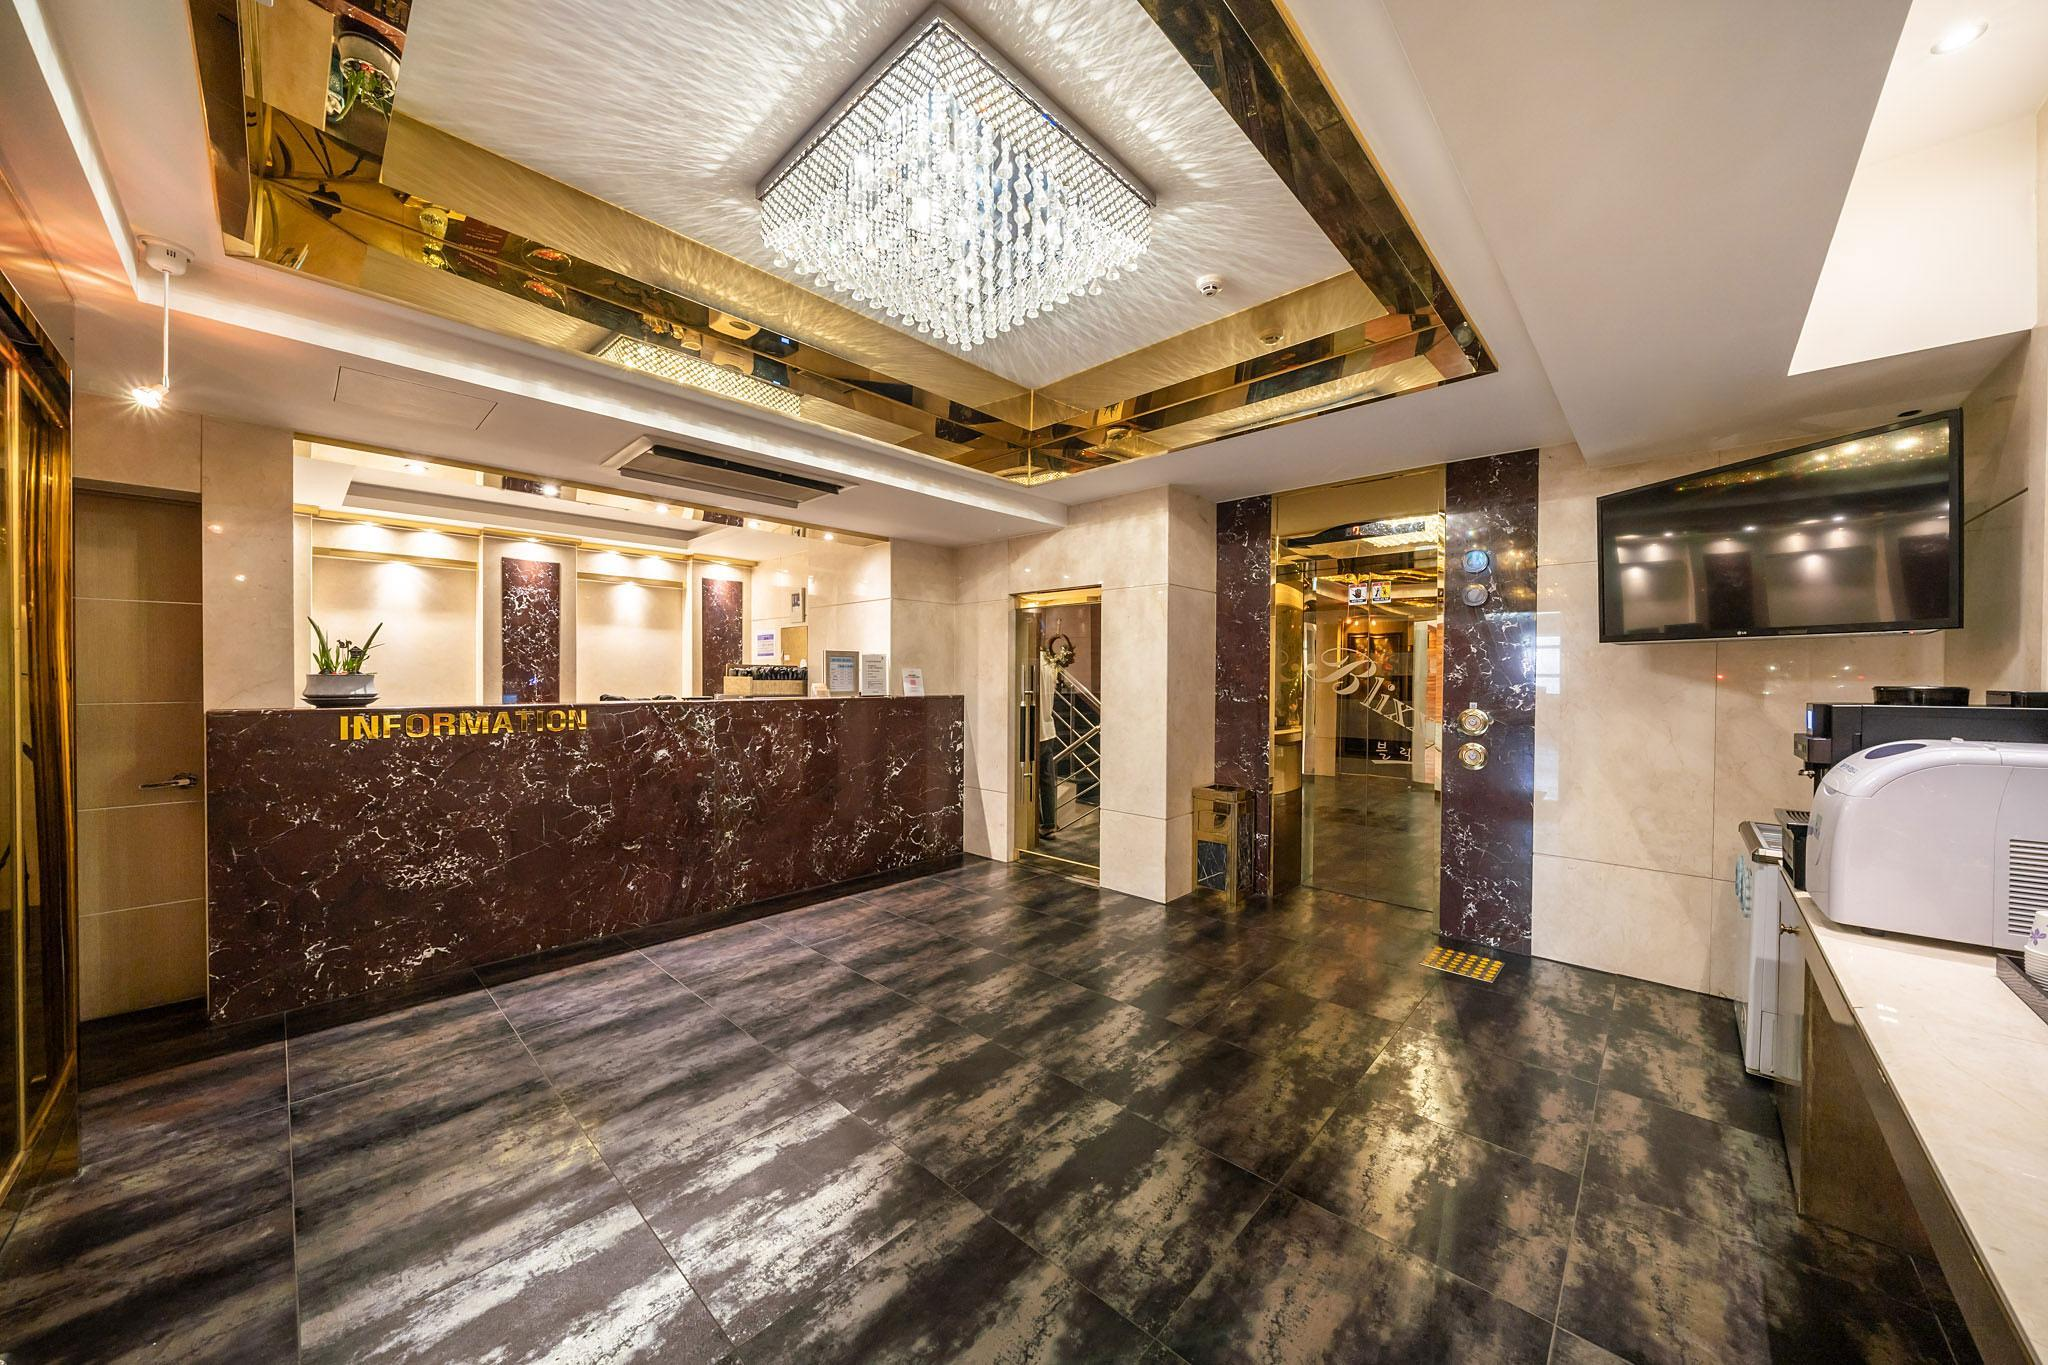 BLIXX HOTEL